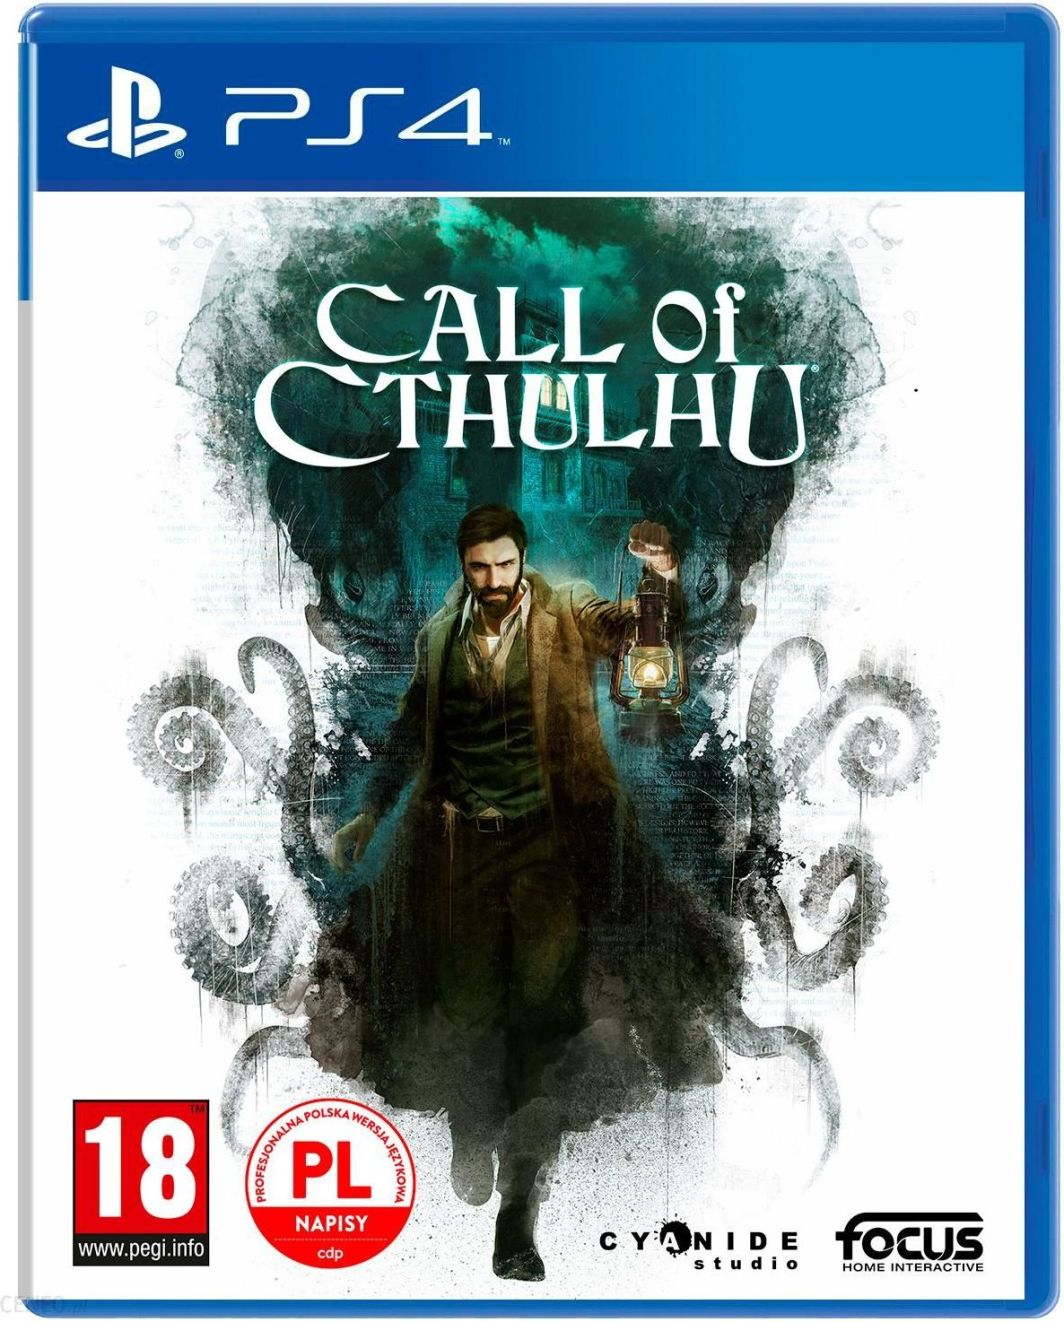 Call of Cthuluh PS4 1